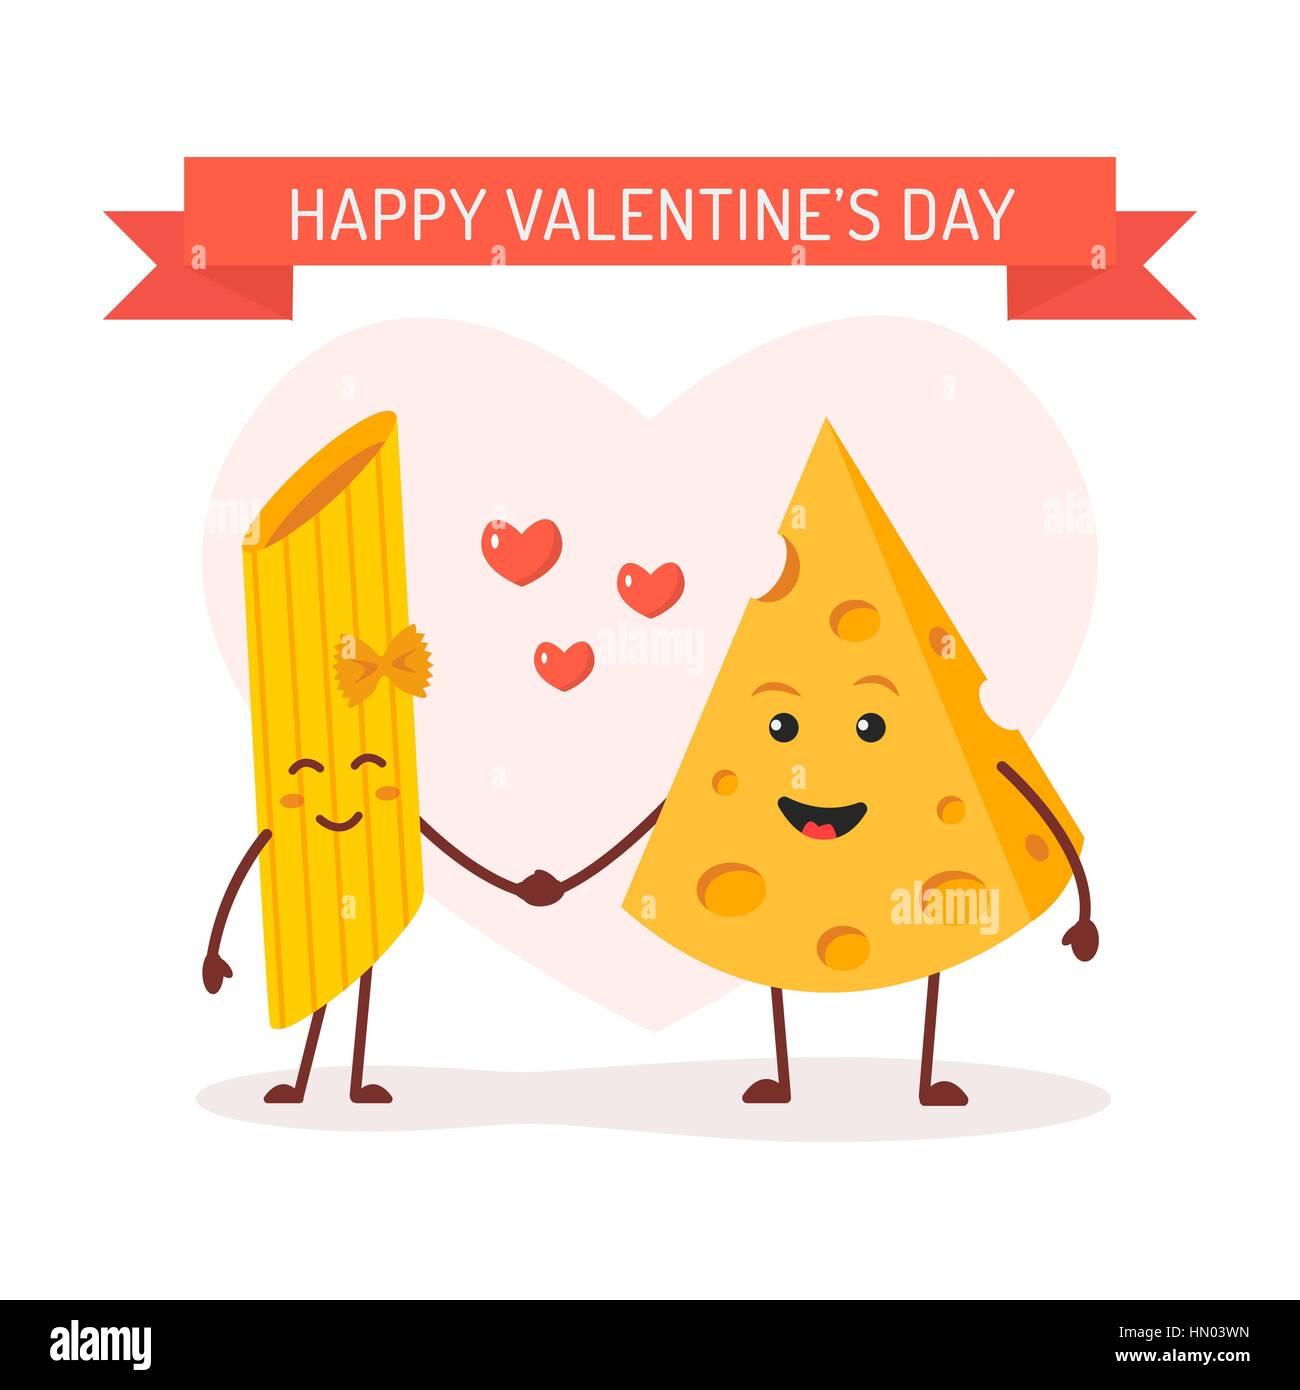 Valentines day card love between pasta and cheese cute comic stock valentines day card love between pasta and cheese cute comic characters vector cartoon voltagebd Choice Image